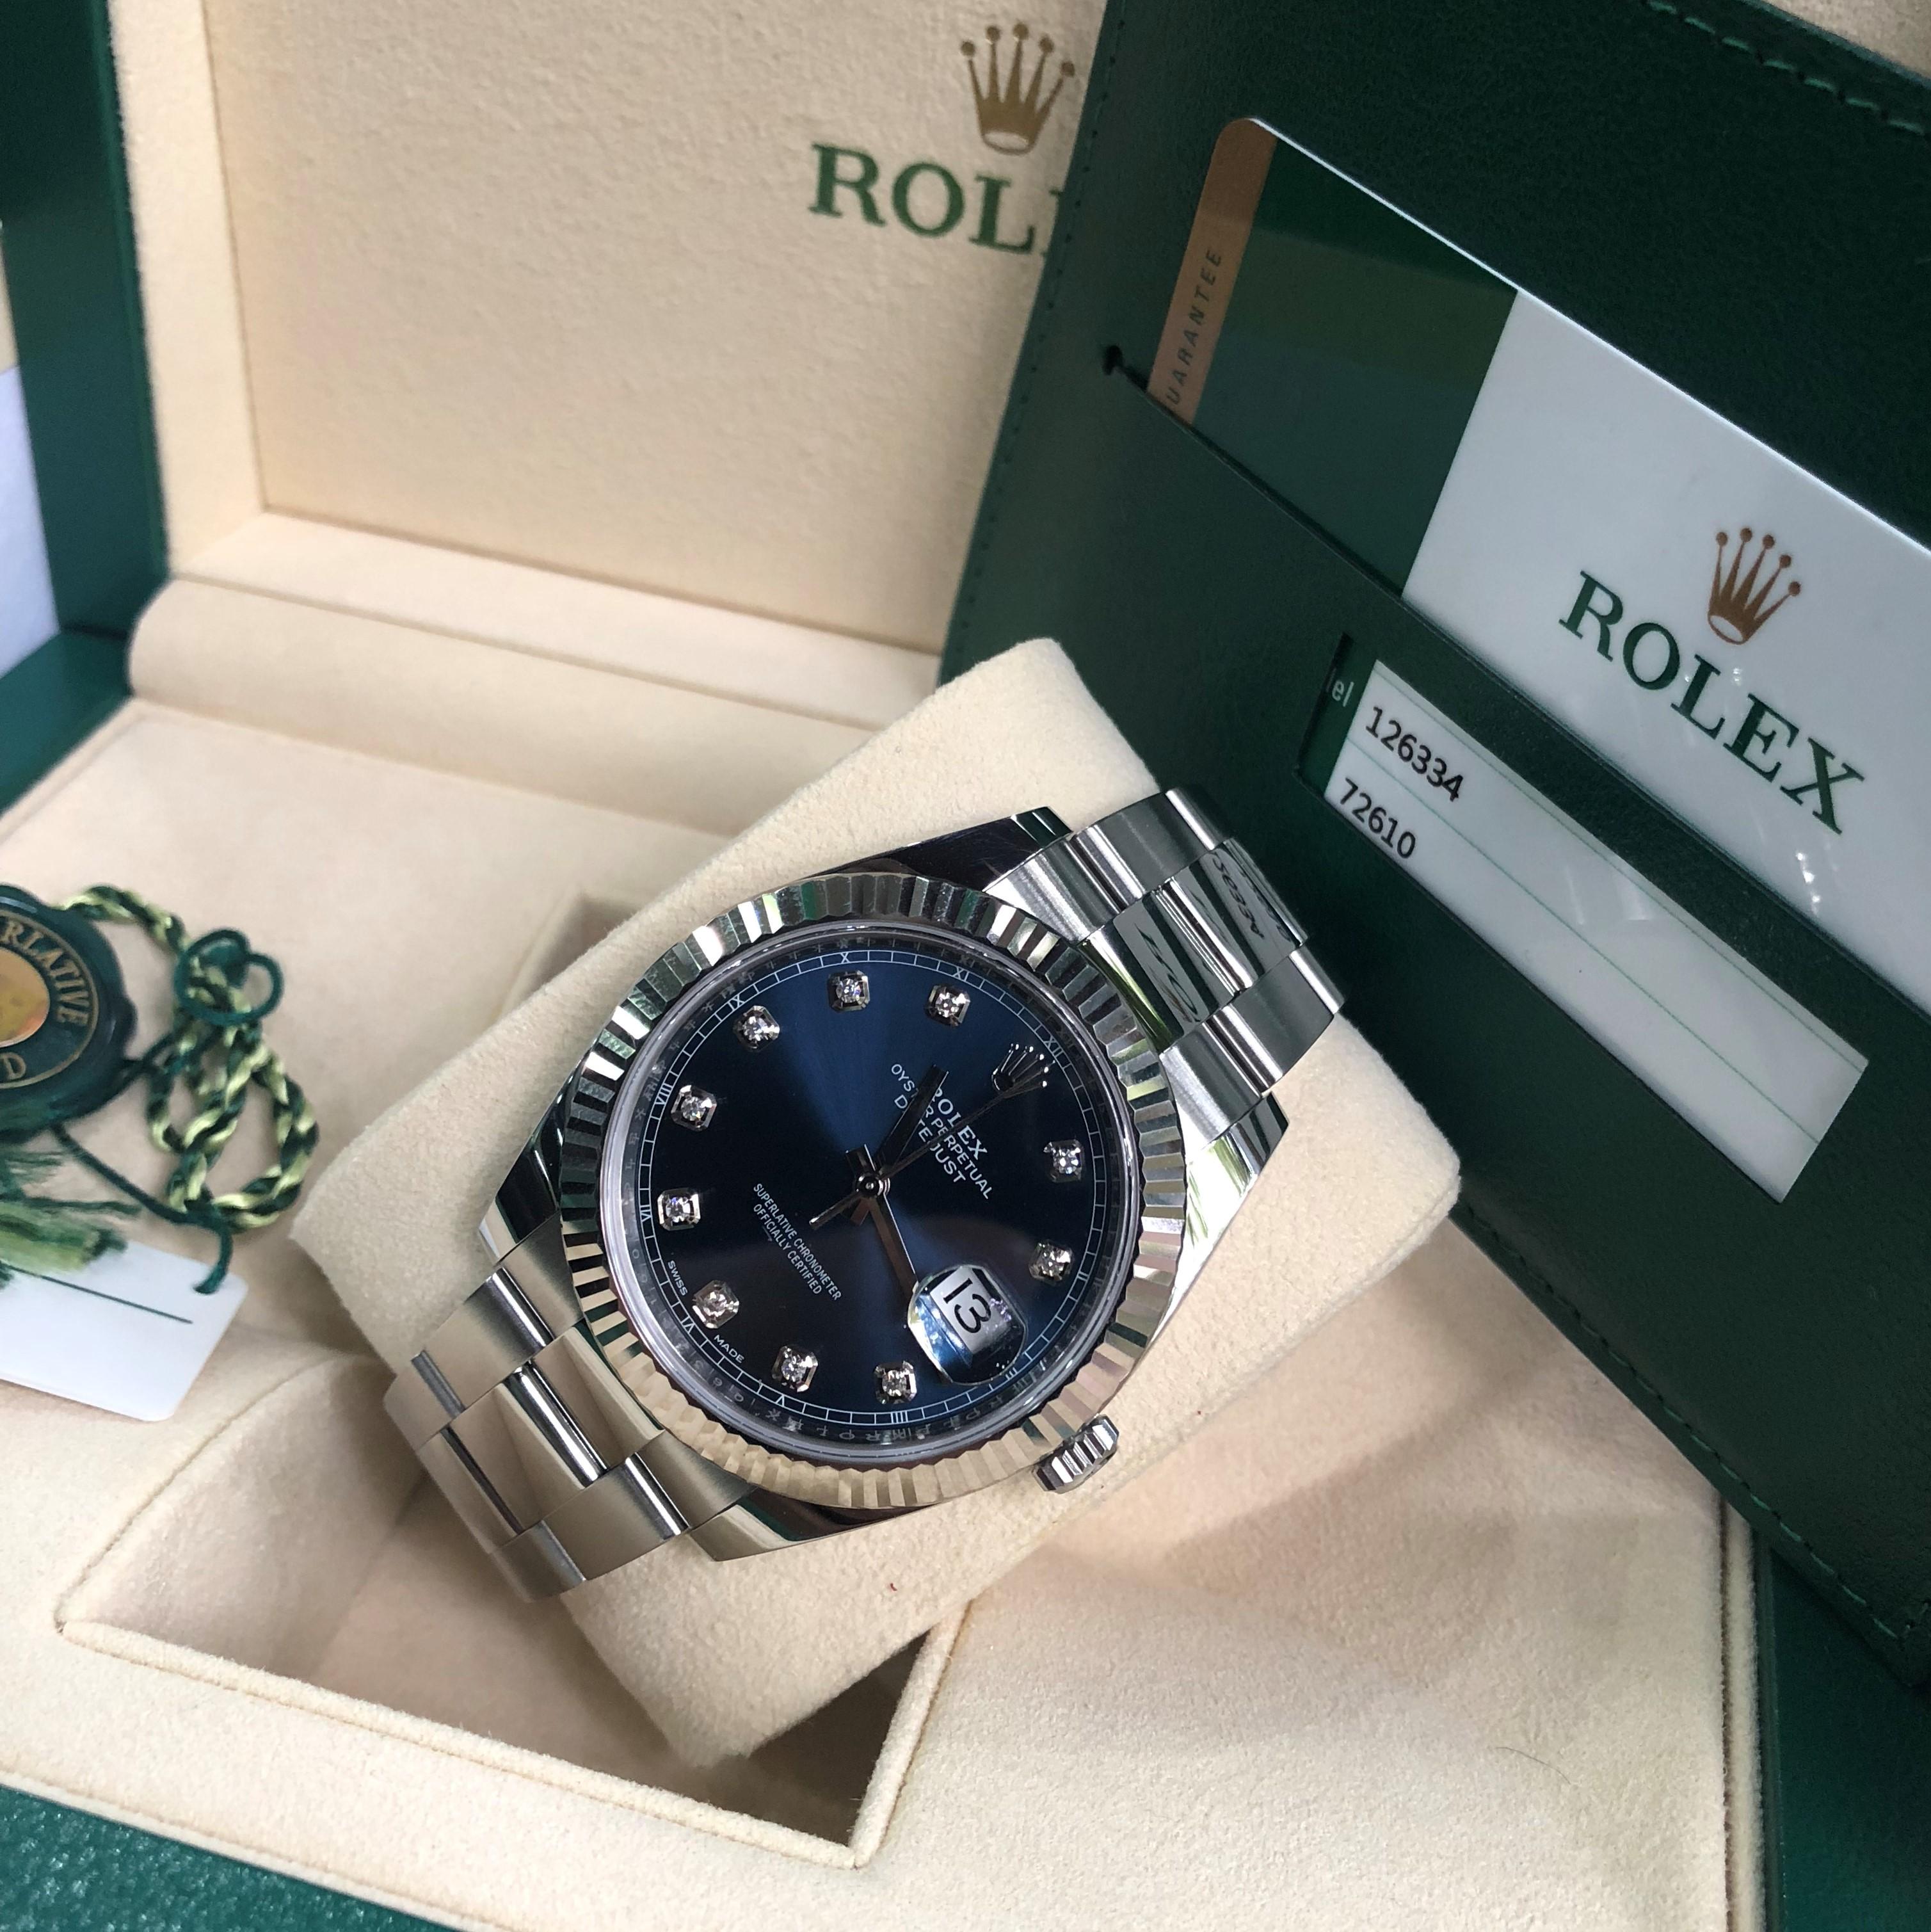 Rolex Datejust 126334 mặt xanh NaVy Size 41mm Fullbook 2018